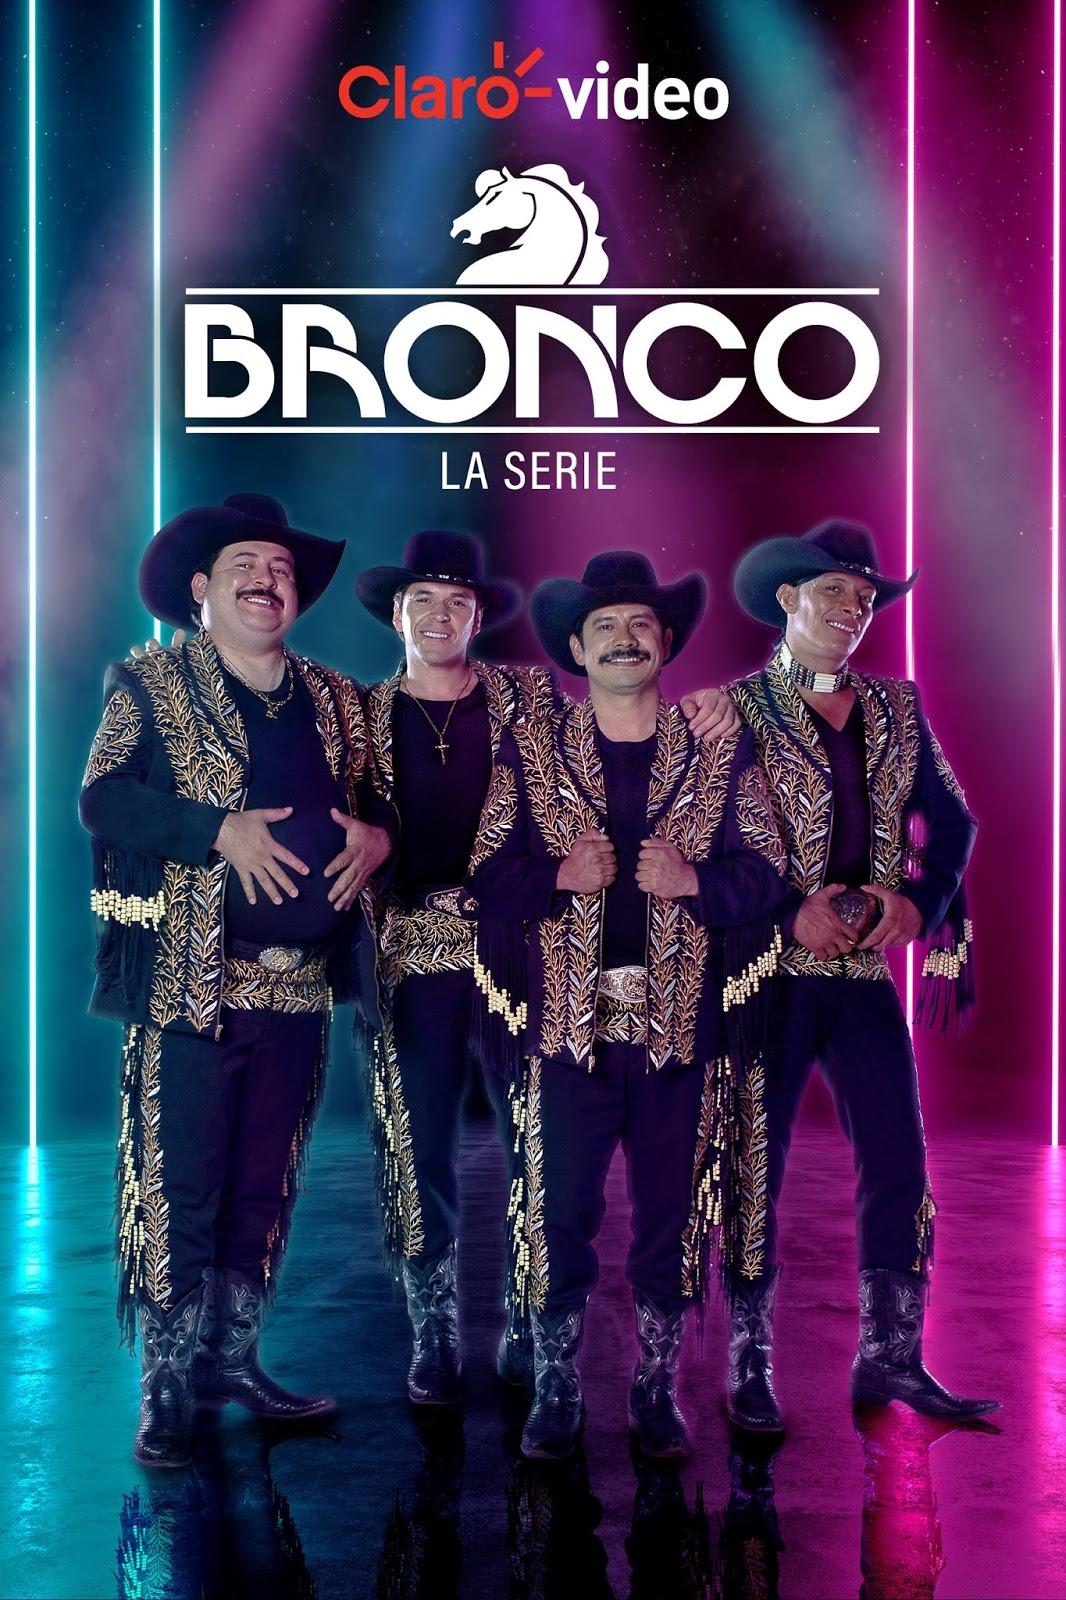 Bronco: La serie (2019) Temporada 1 WEB-DL 1080p Latino